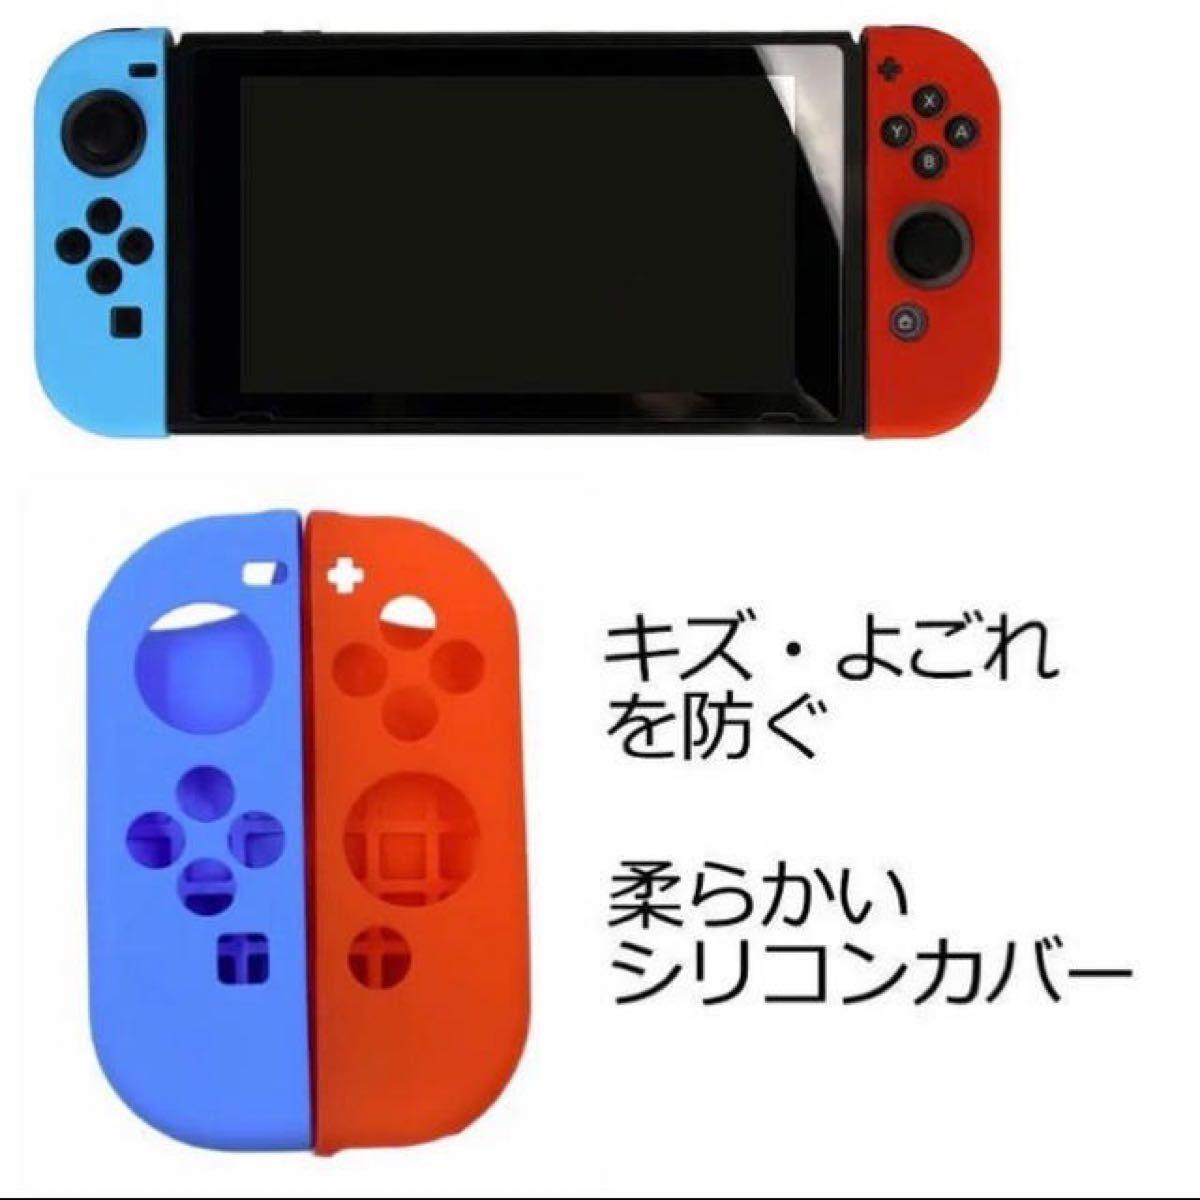 Nintendo Switch ジョイコン カバー シリコン 青 赤